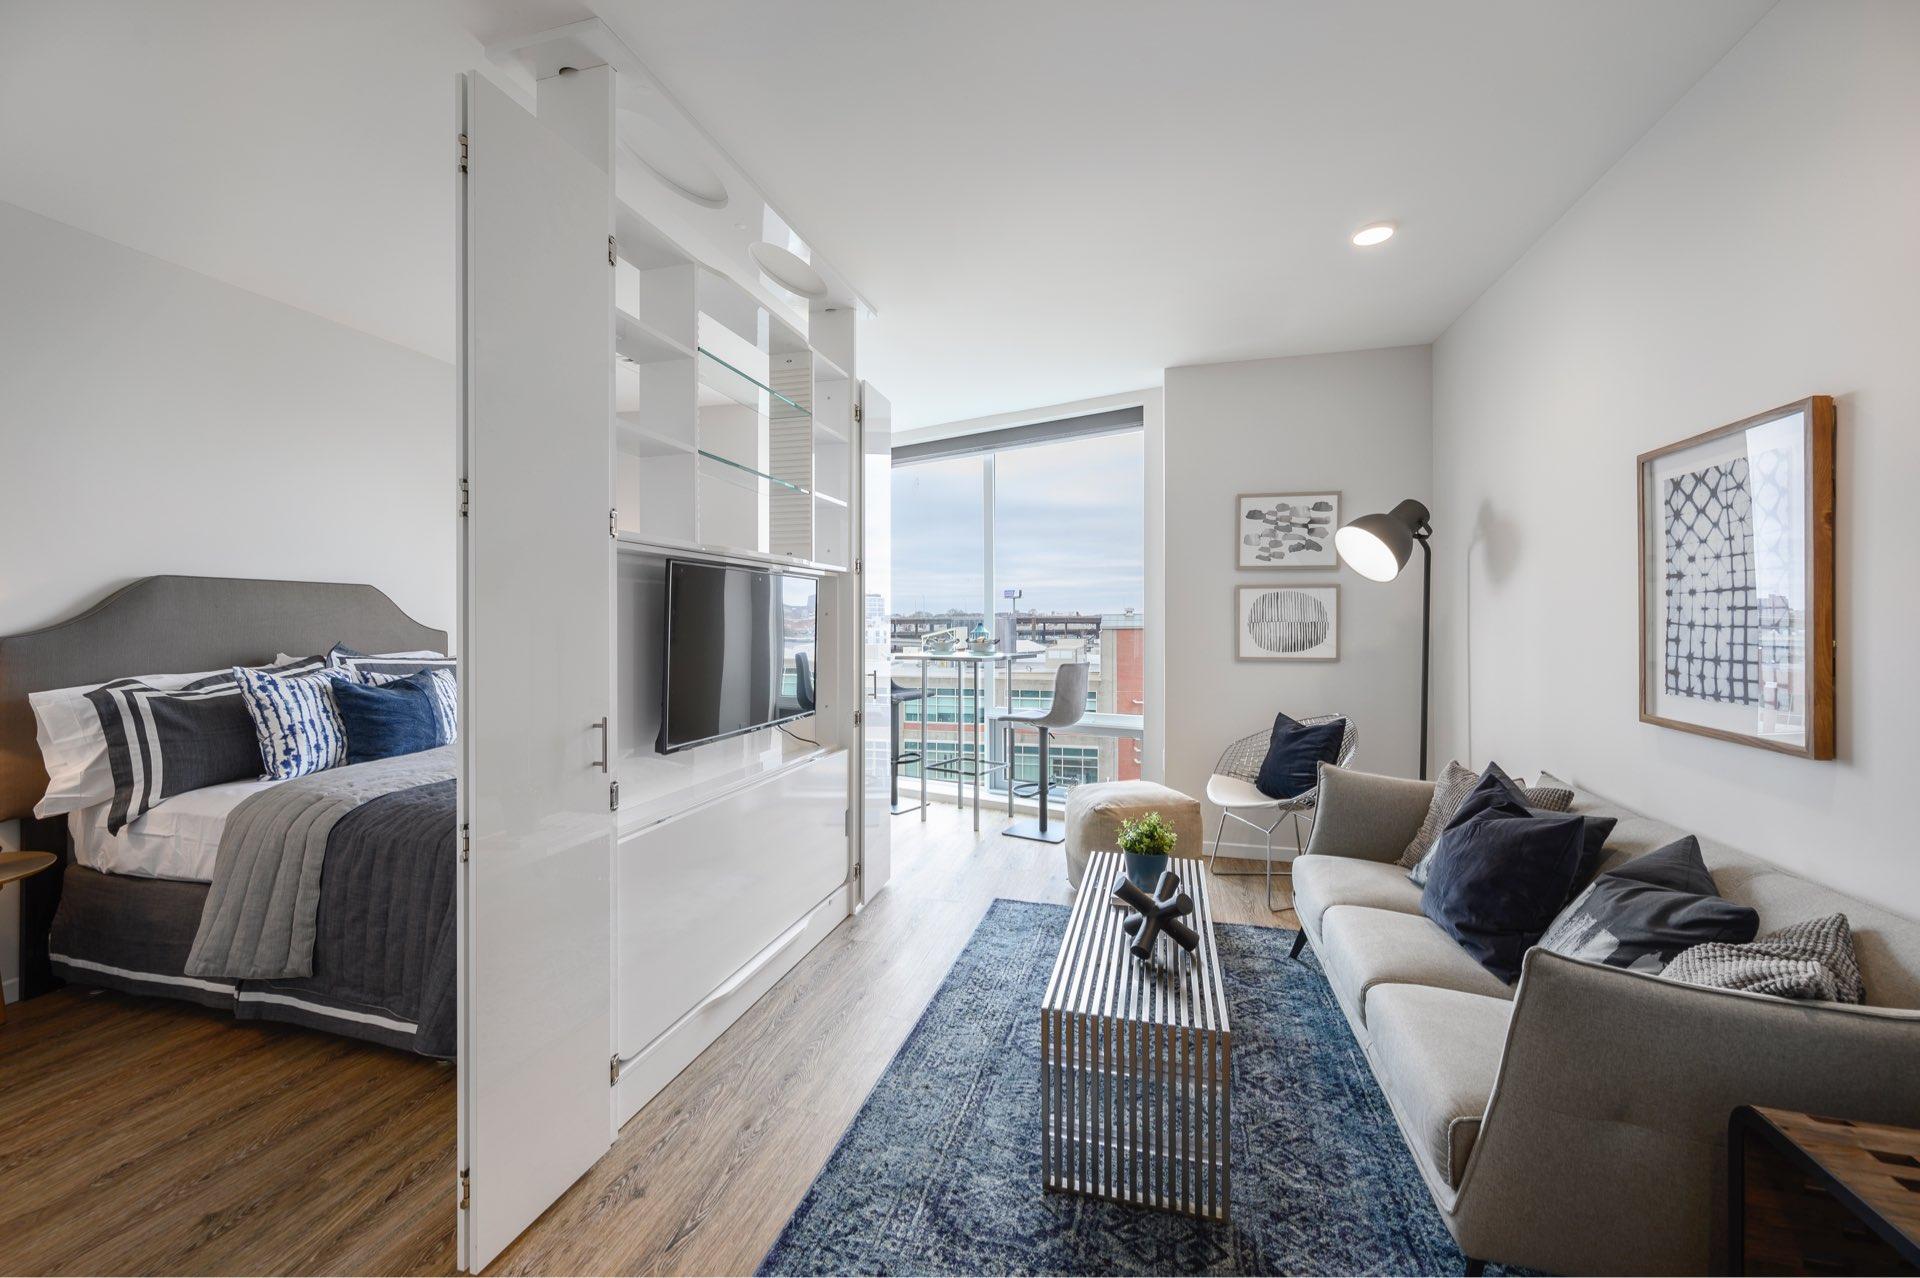 Apartments img 19